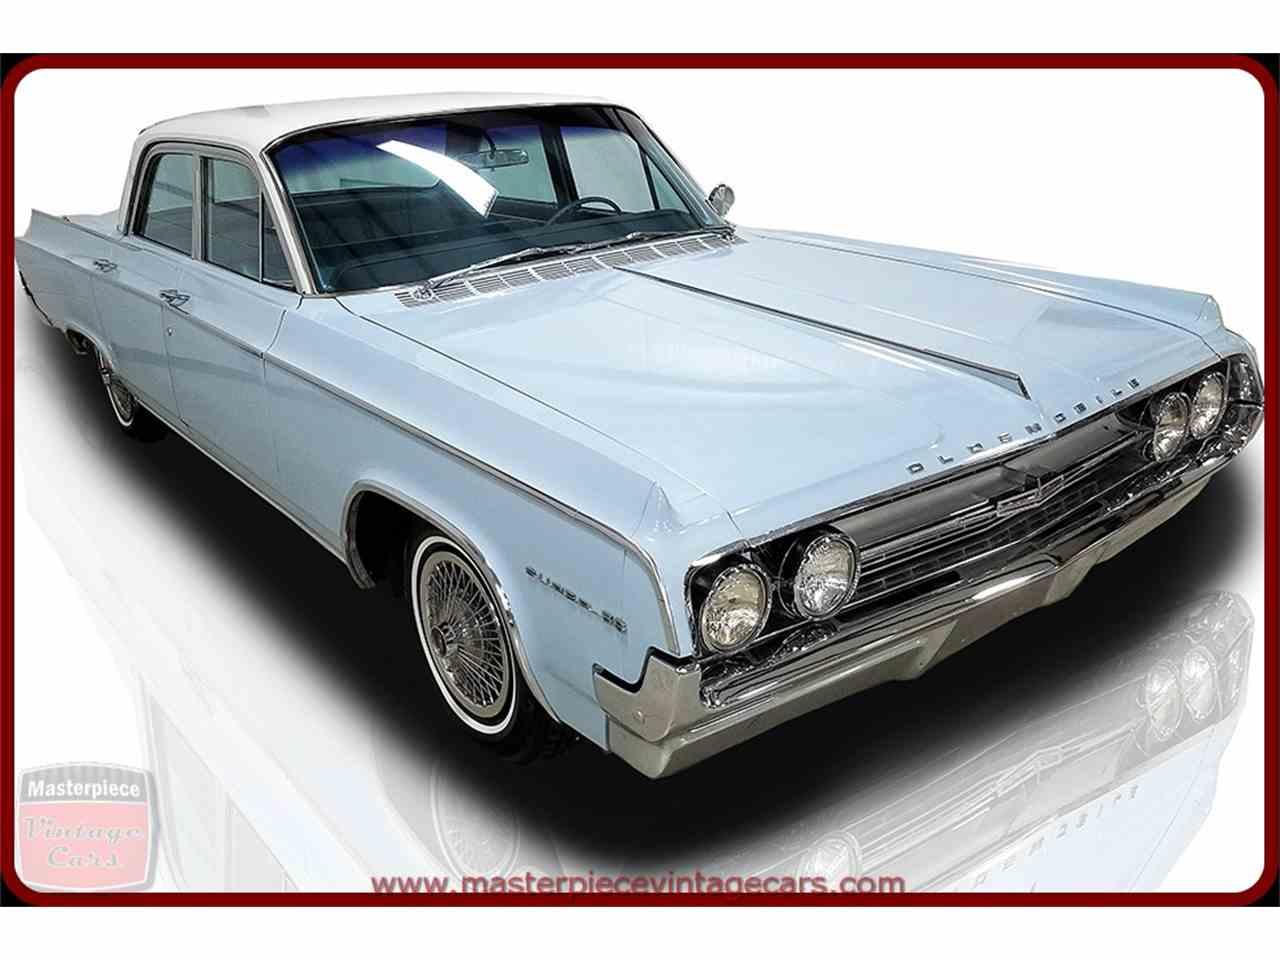 1964 Oldsmobile Super 88 for Sale - CC-989349